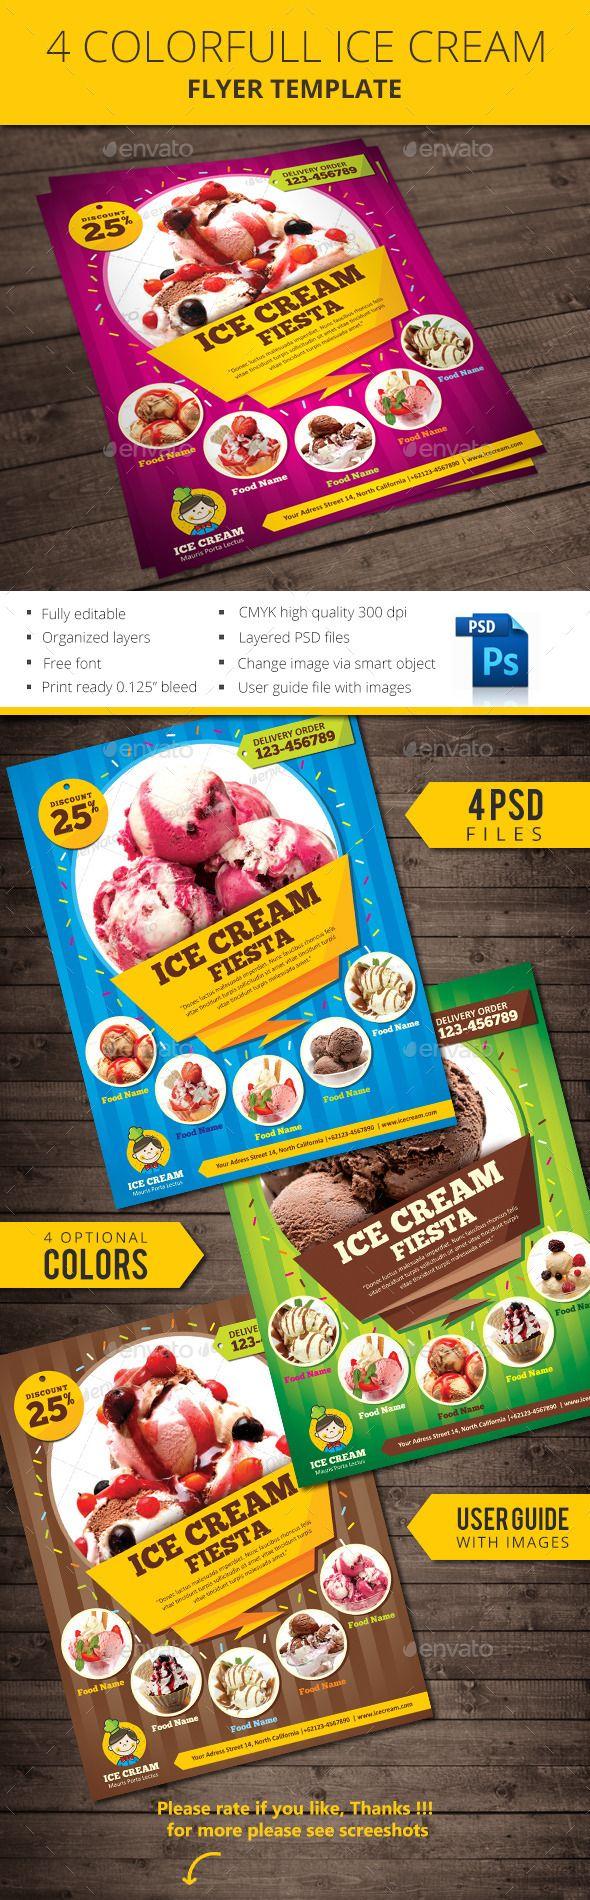 Ice Cream Flyer Template - Commerce Flyers